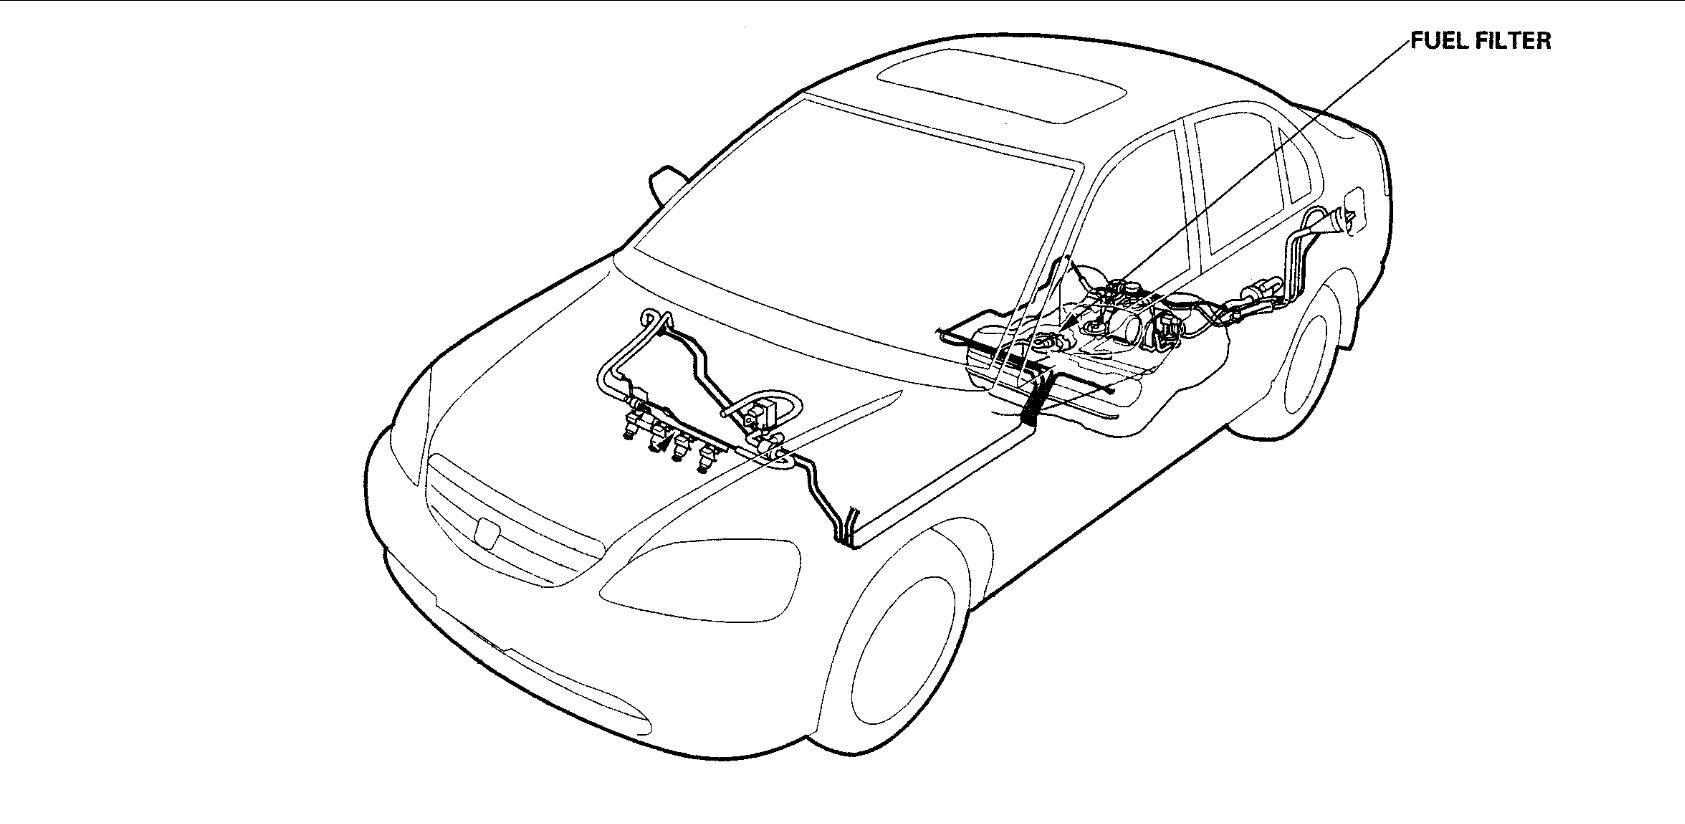 Honda Civic Fuel Filter Location